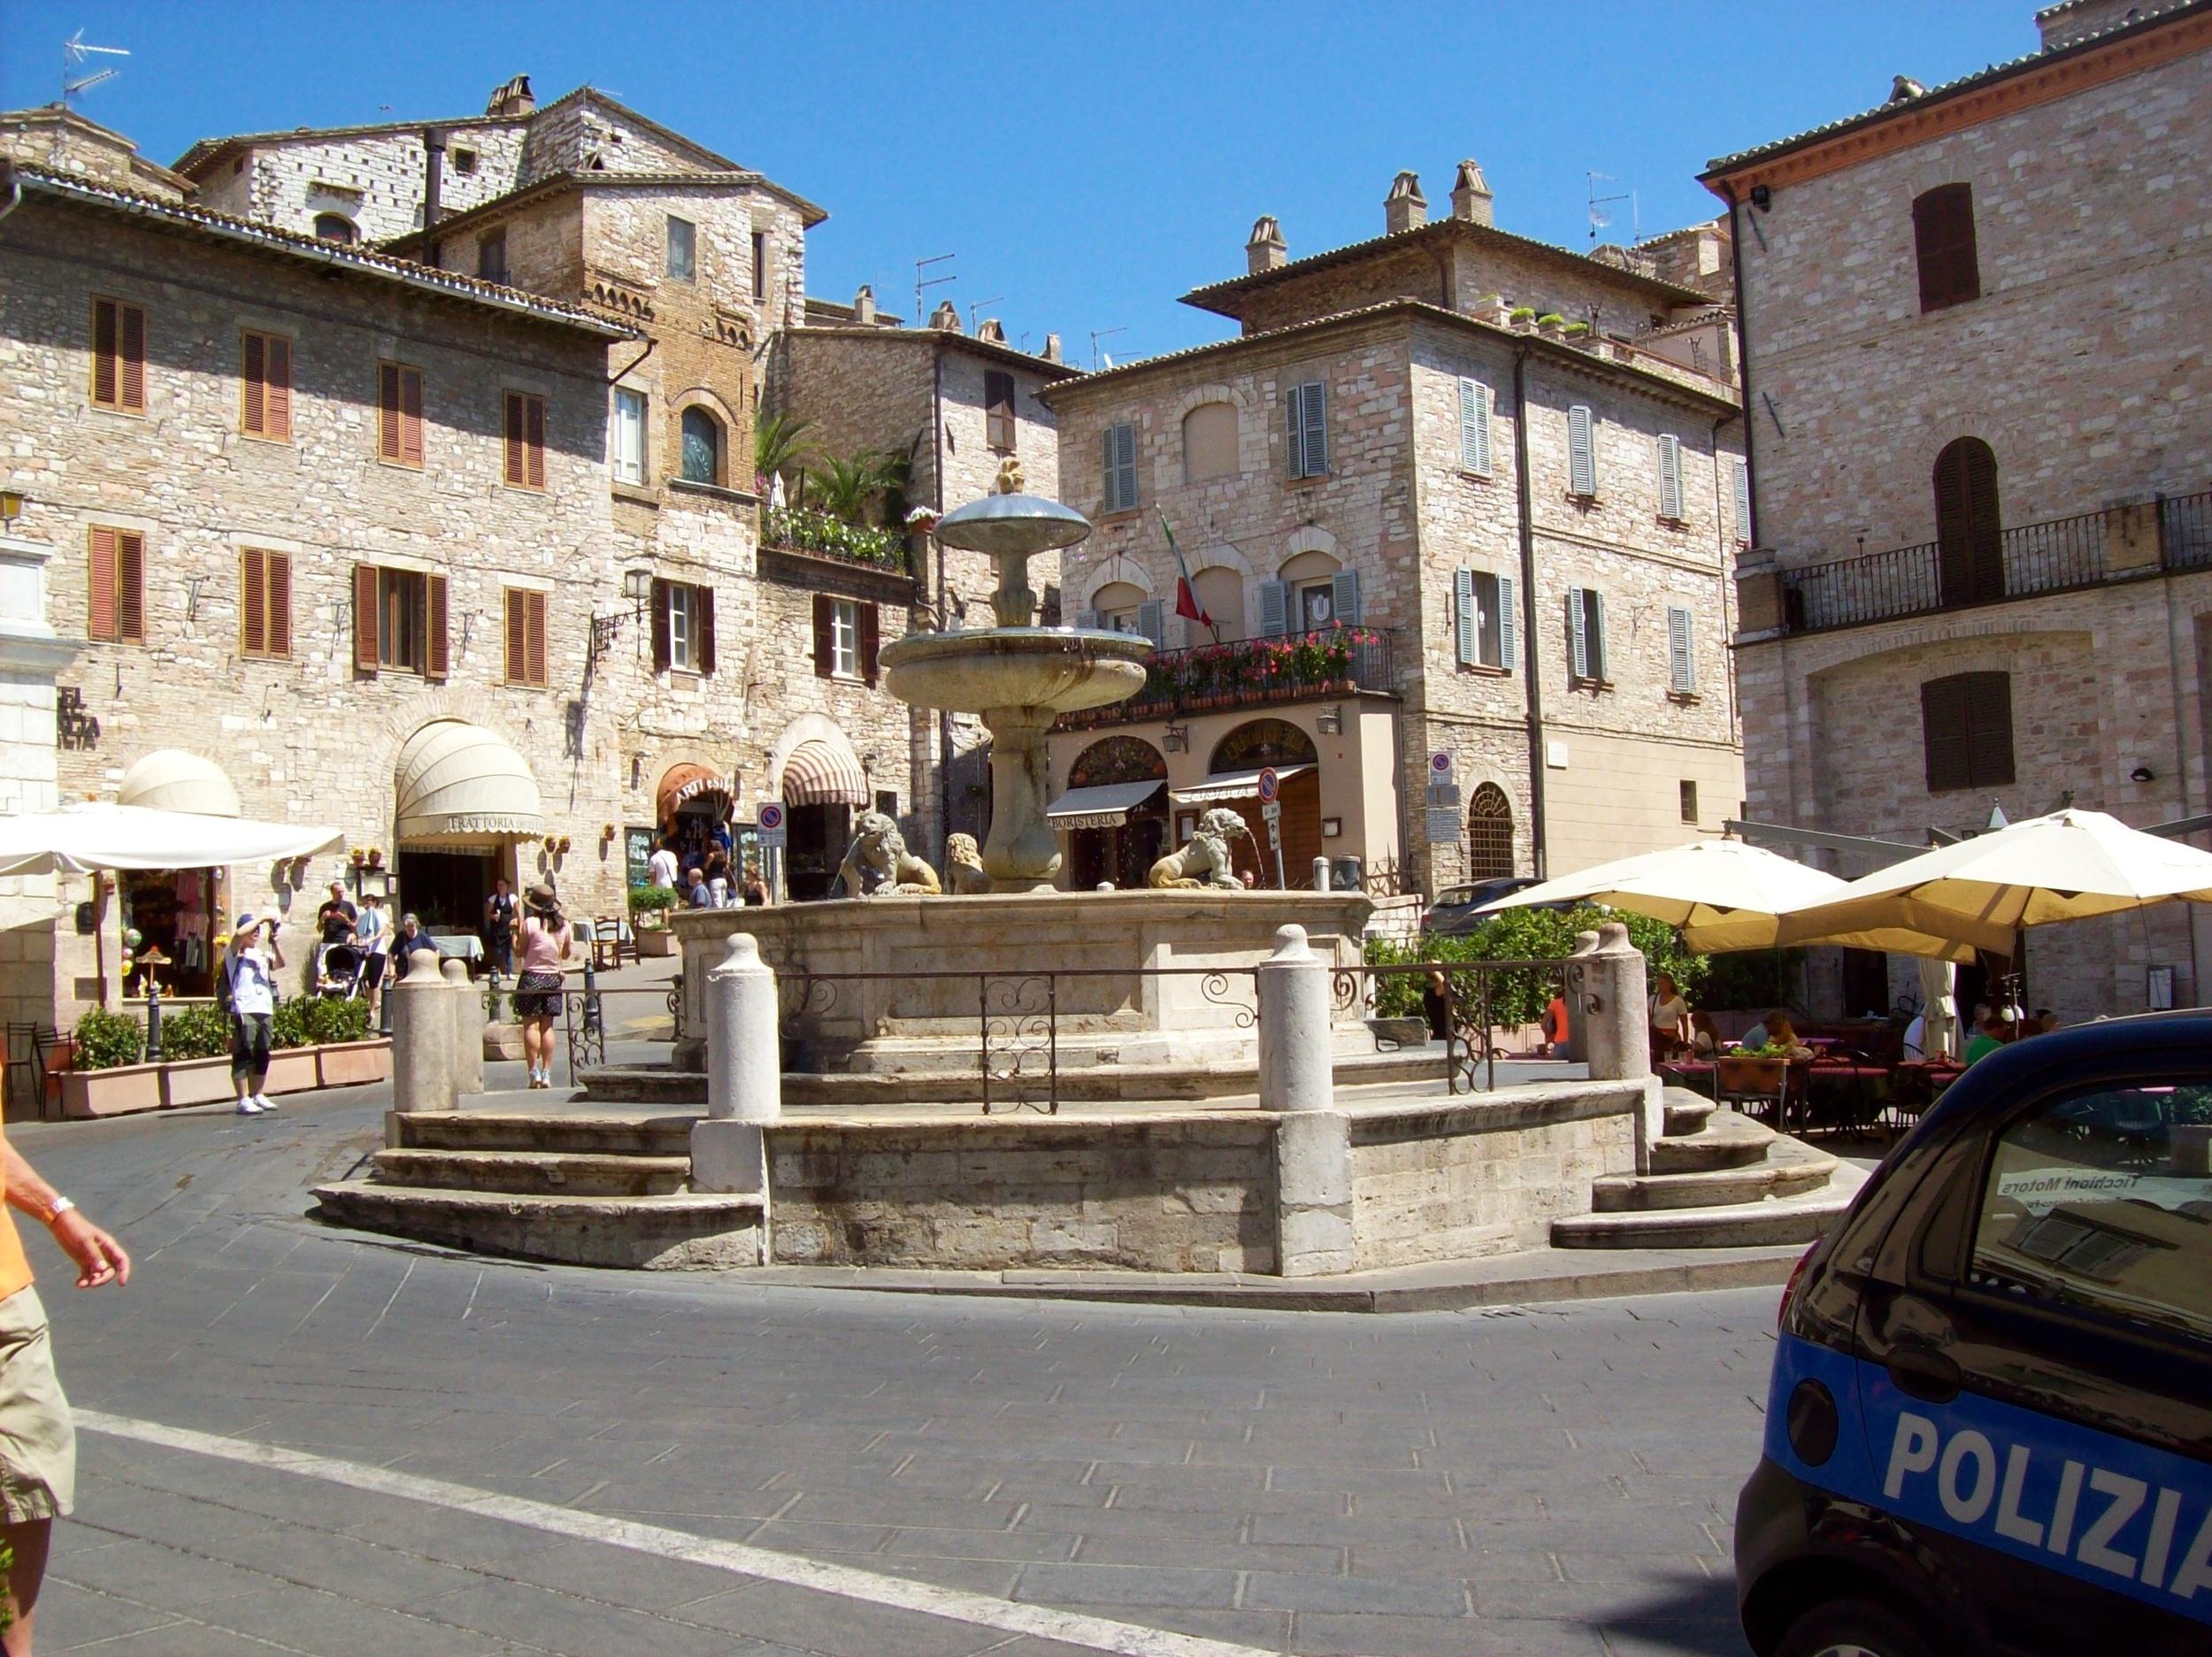 CRO Italy web 2012 - 16.jpg